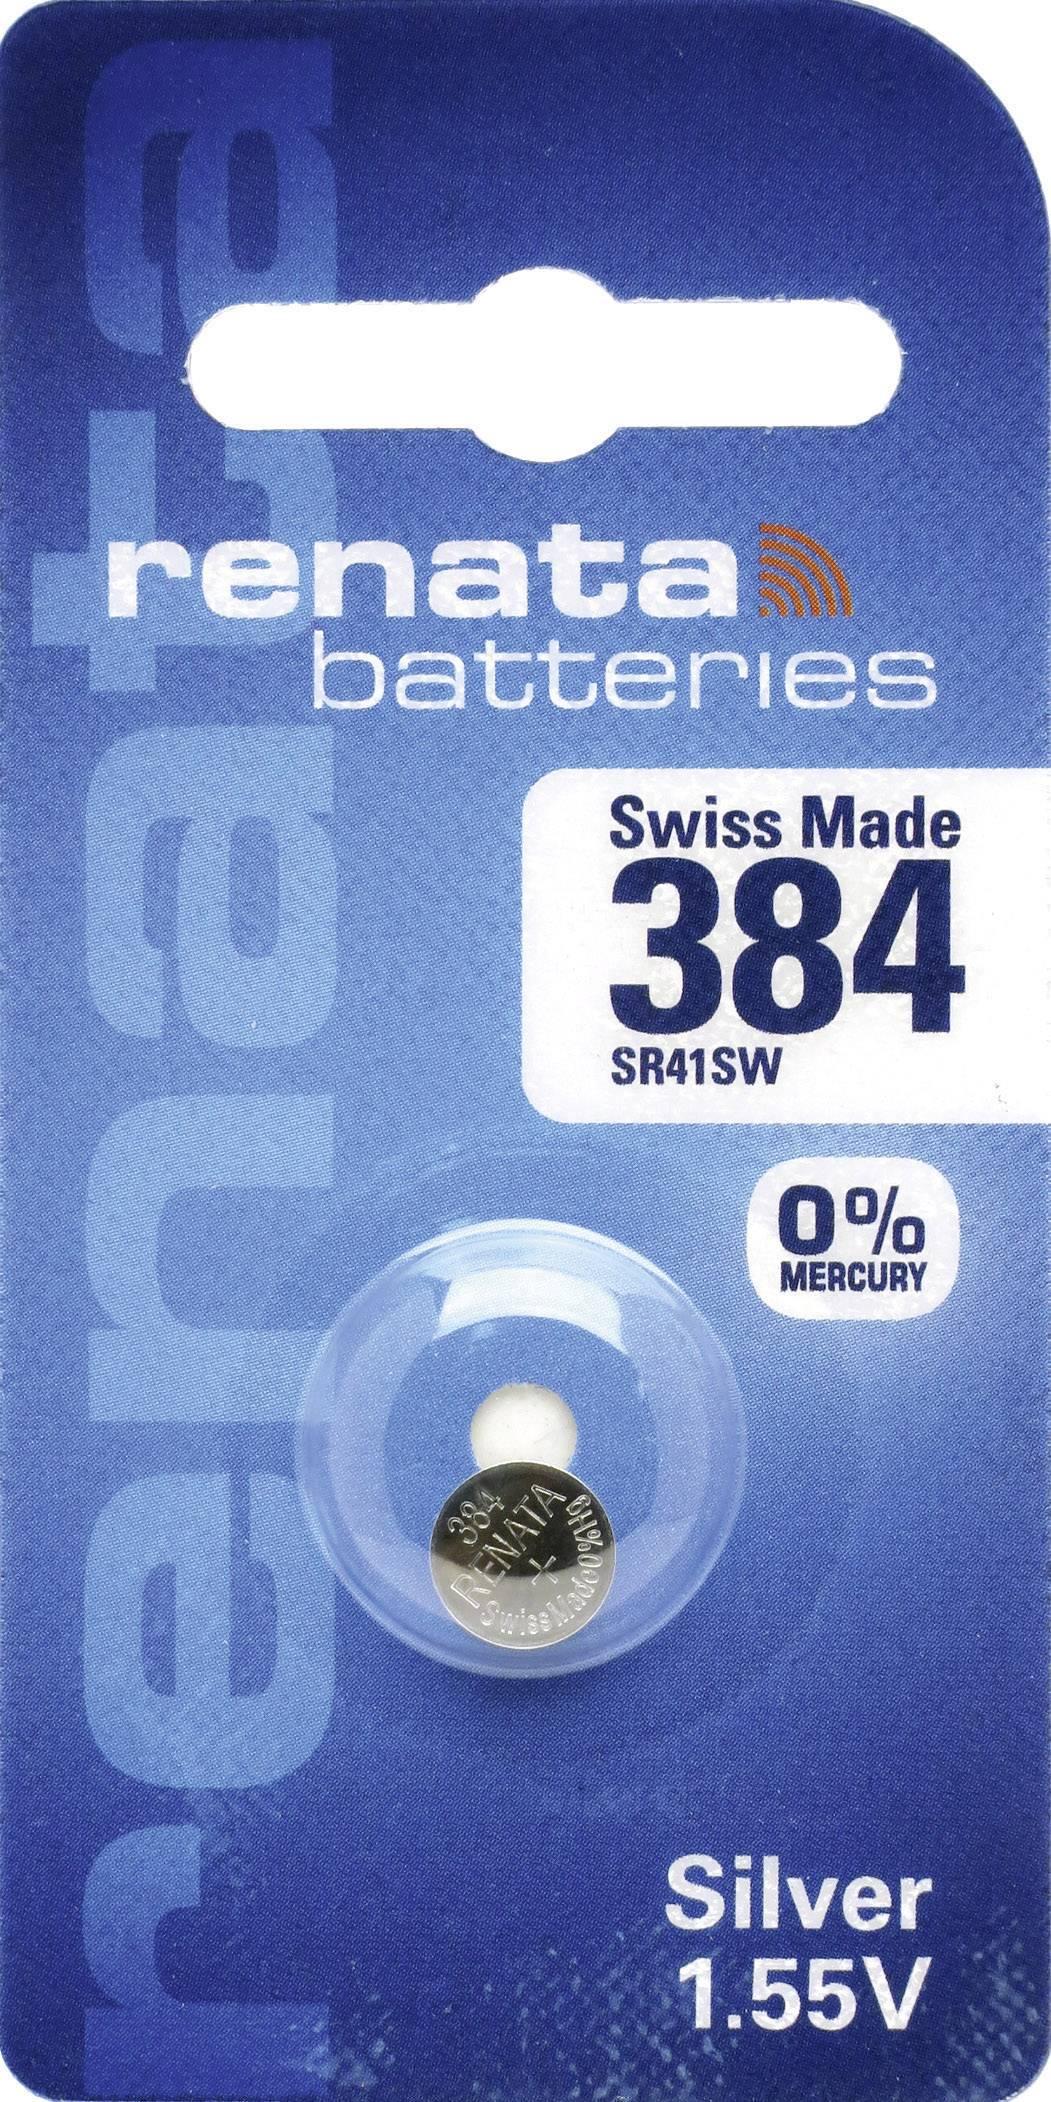 Knoflíková baterie 384, Renata SR41, na bázi oxidu stříbra, 384.CU MF